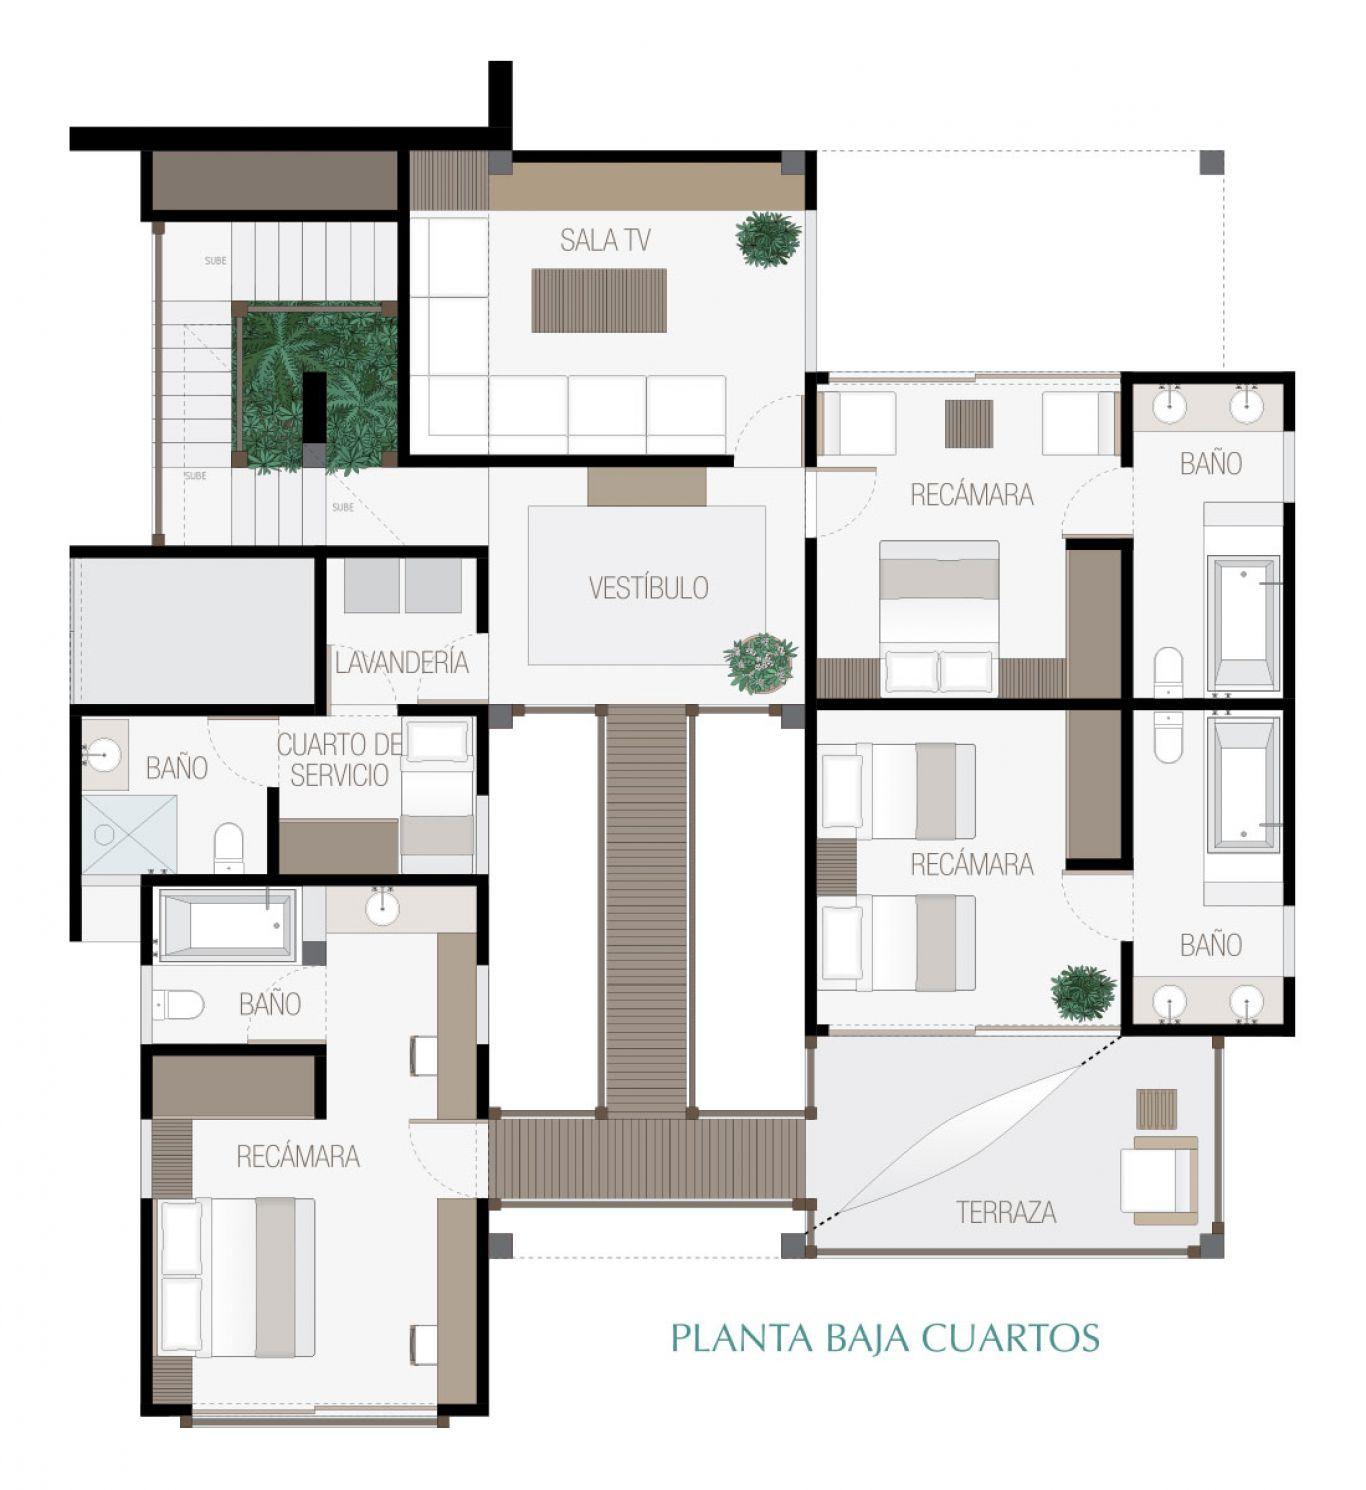 Manai, id 1519068, no 3, plano de villa 10, 300